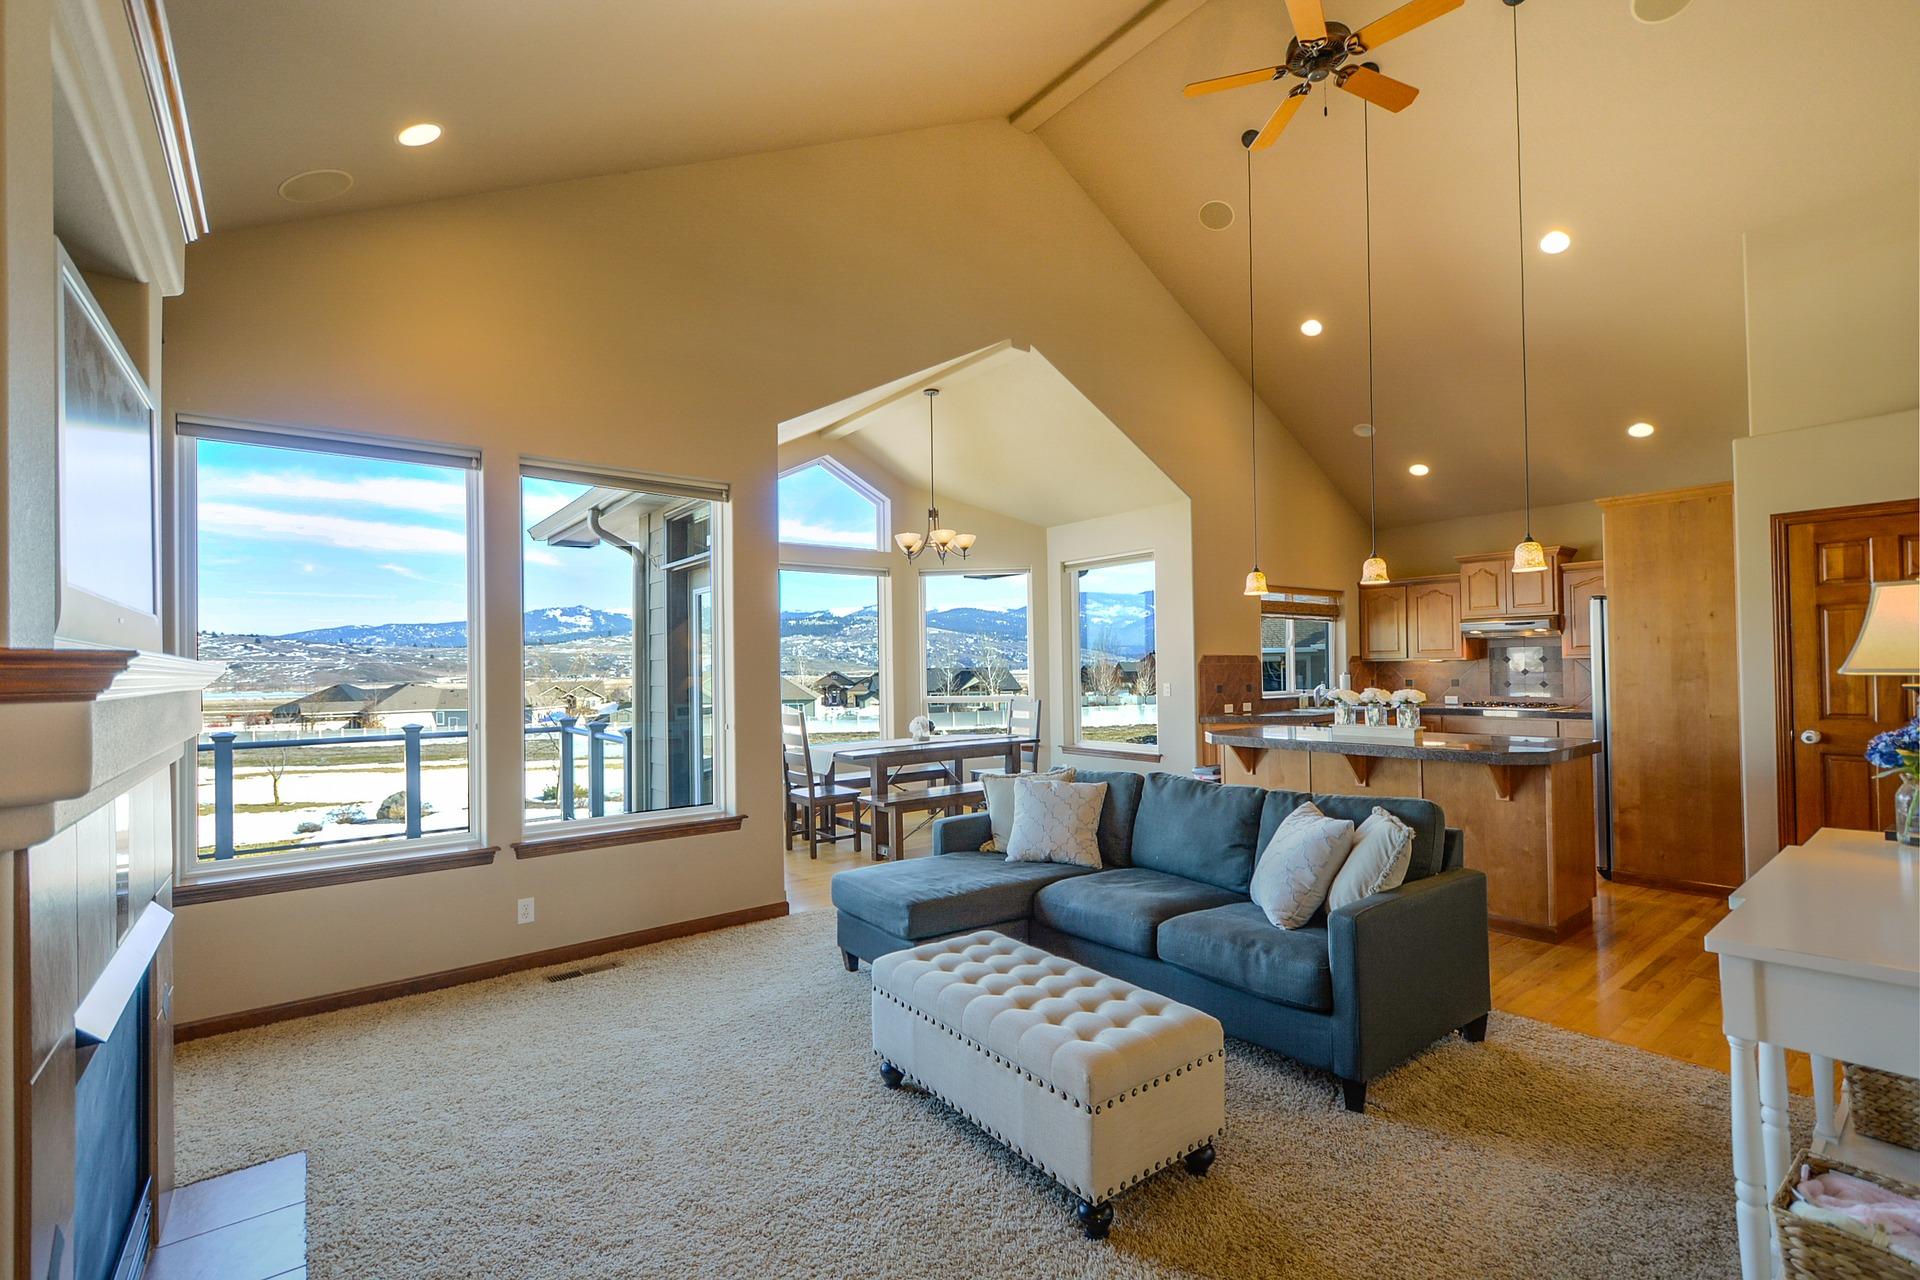 Malý či veľký bungalov poskytuje vlastníkovi komfort